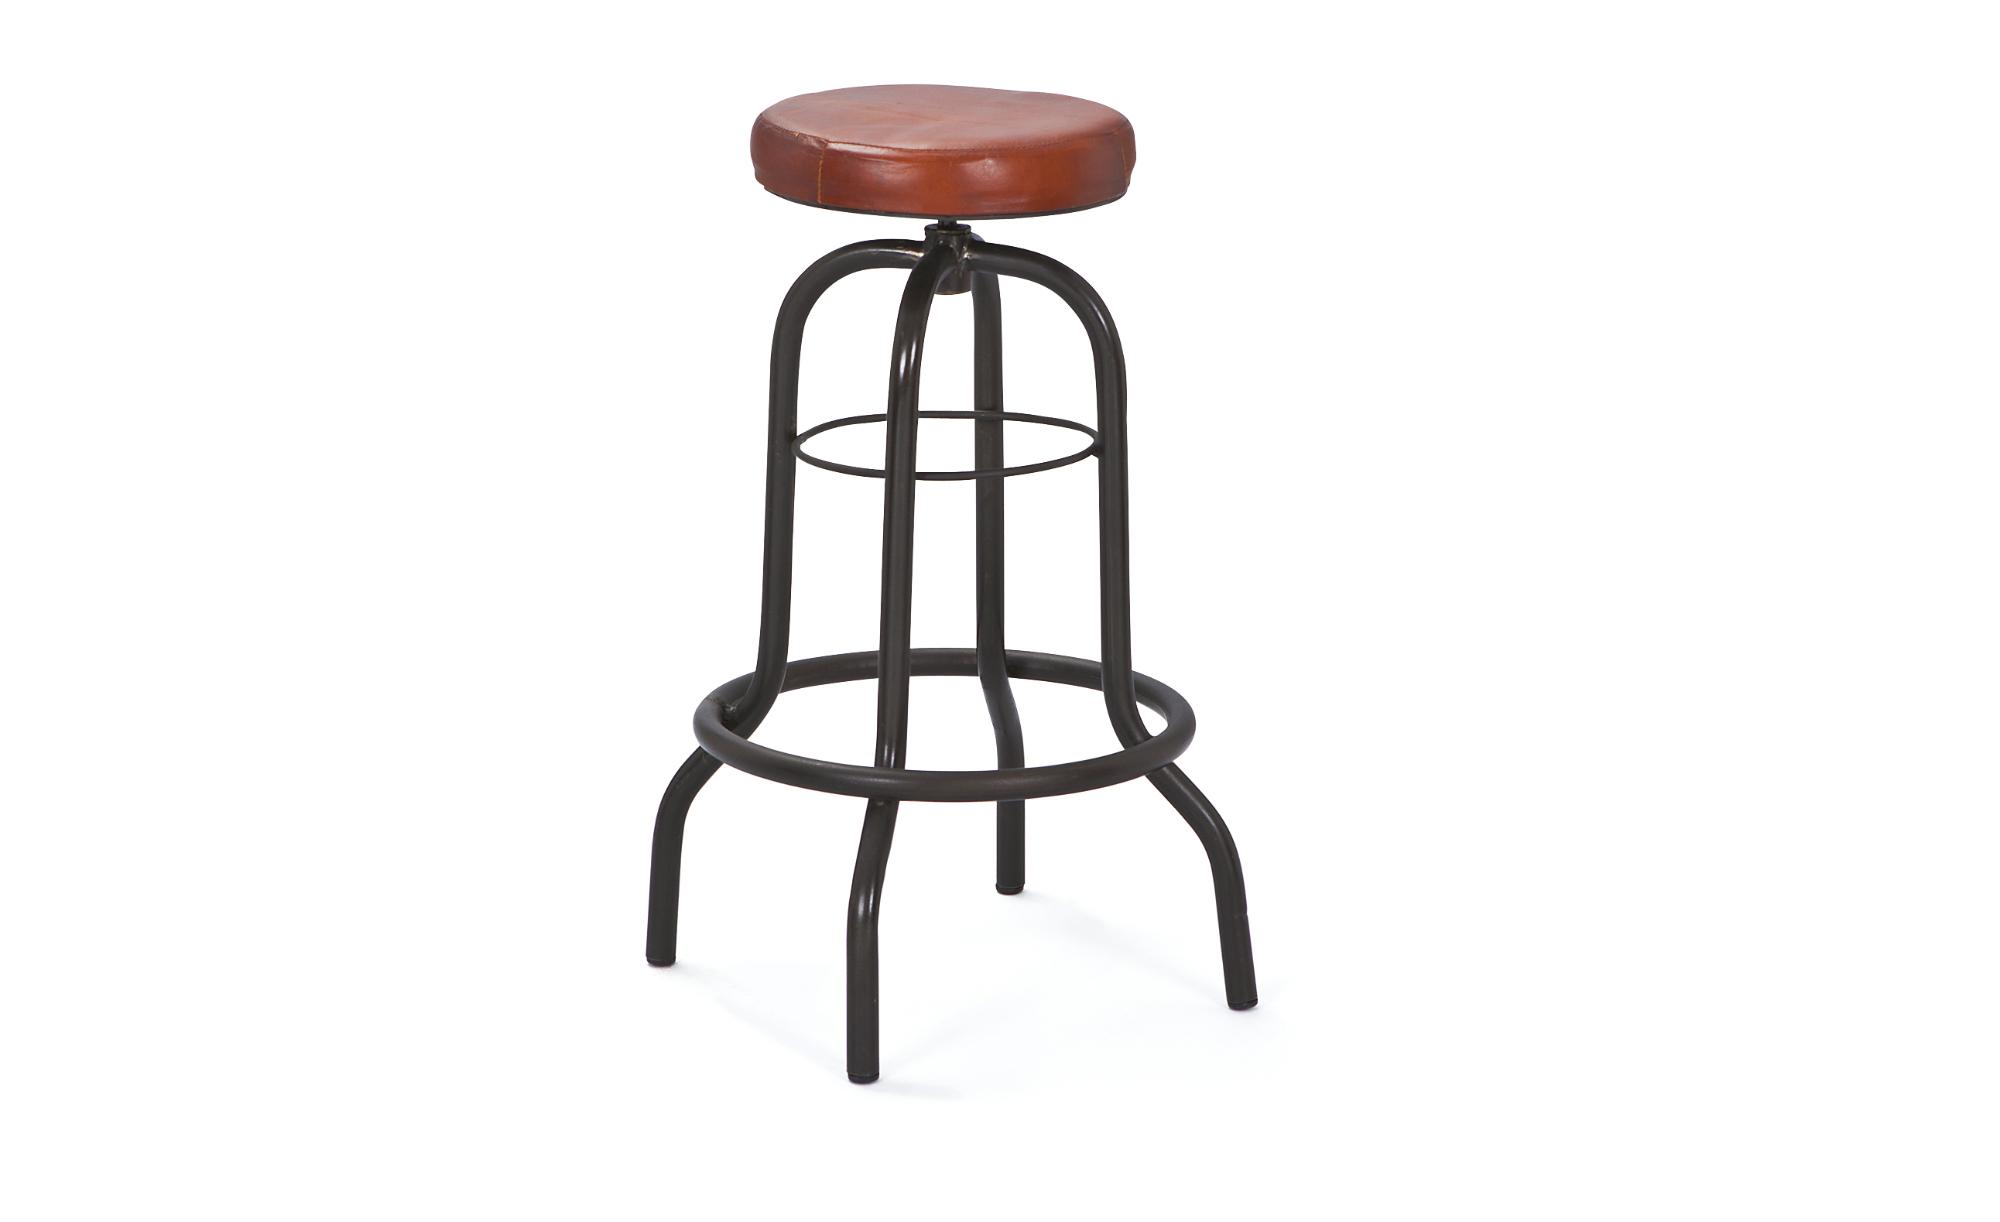 Sconto Barová židle LONDOS